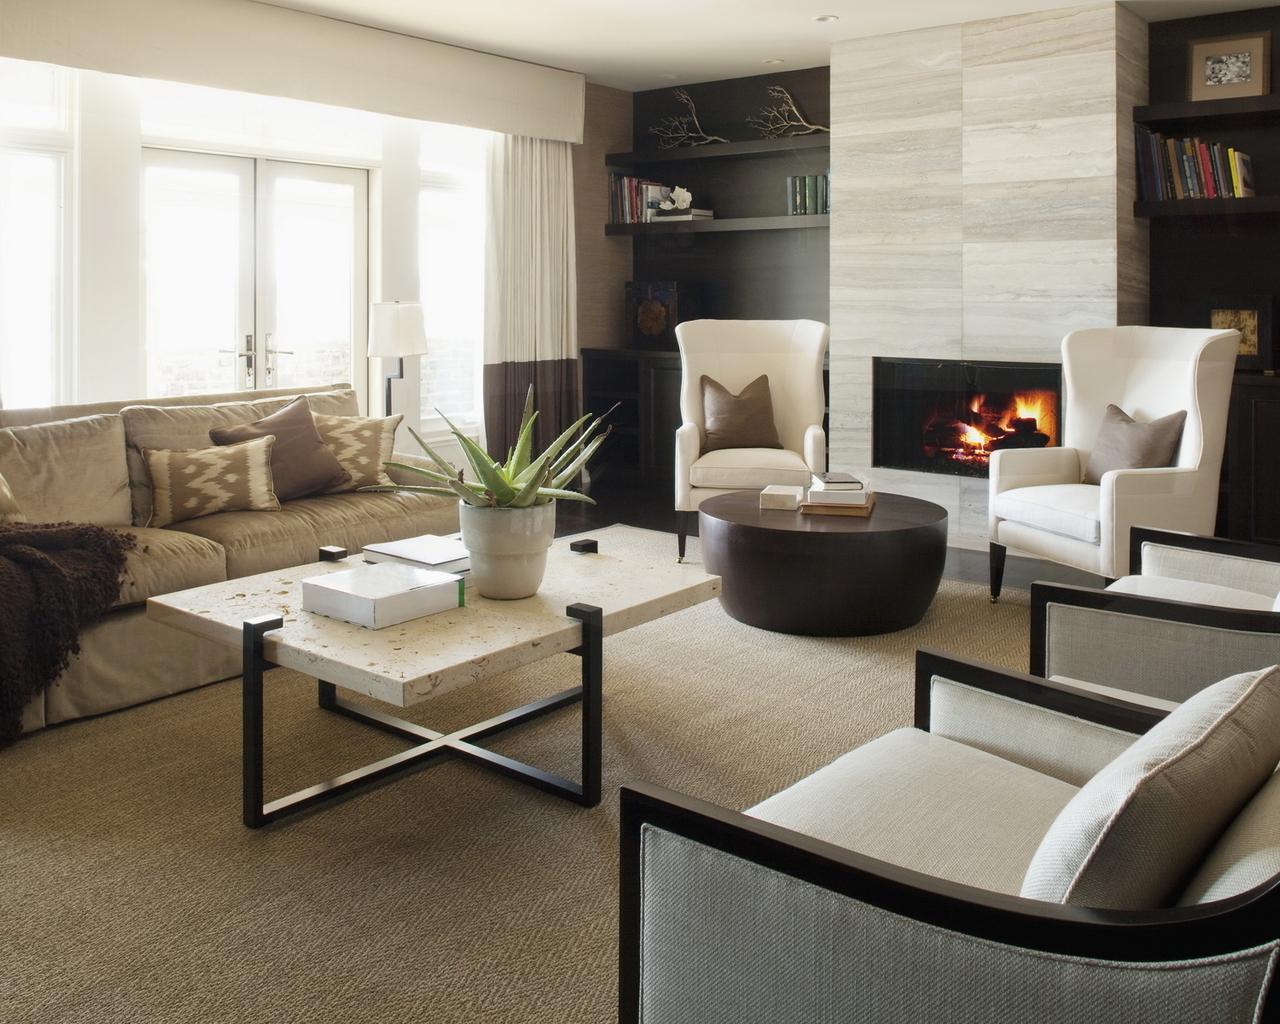 set as desktop background desktop wallpapers interior living room